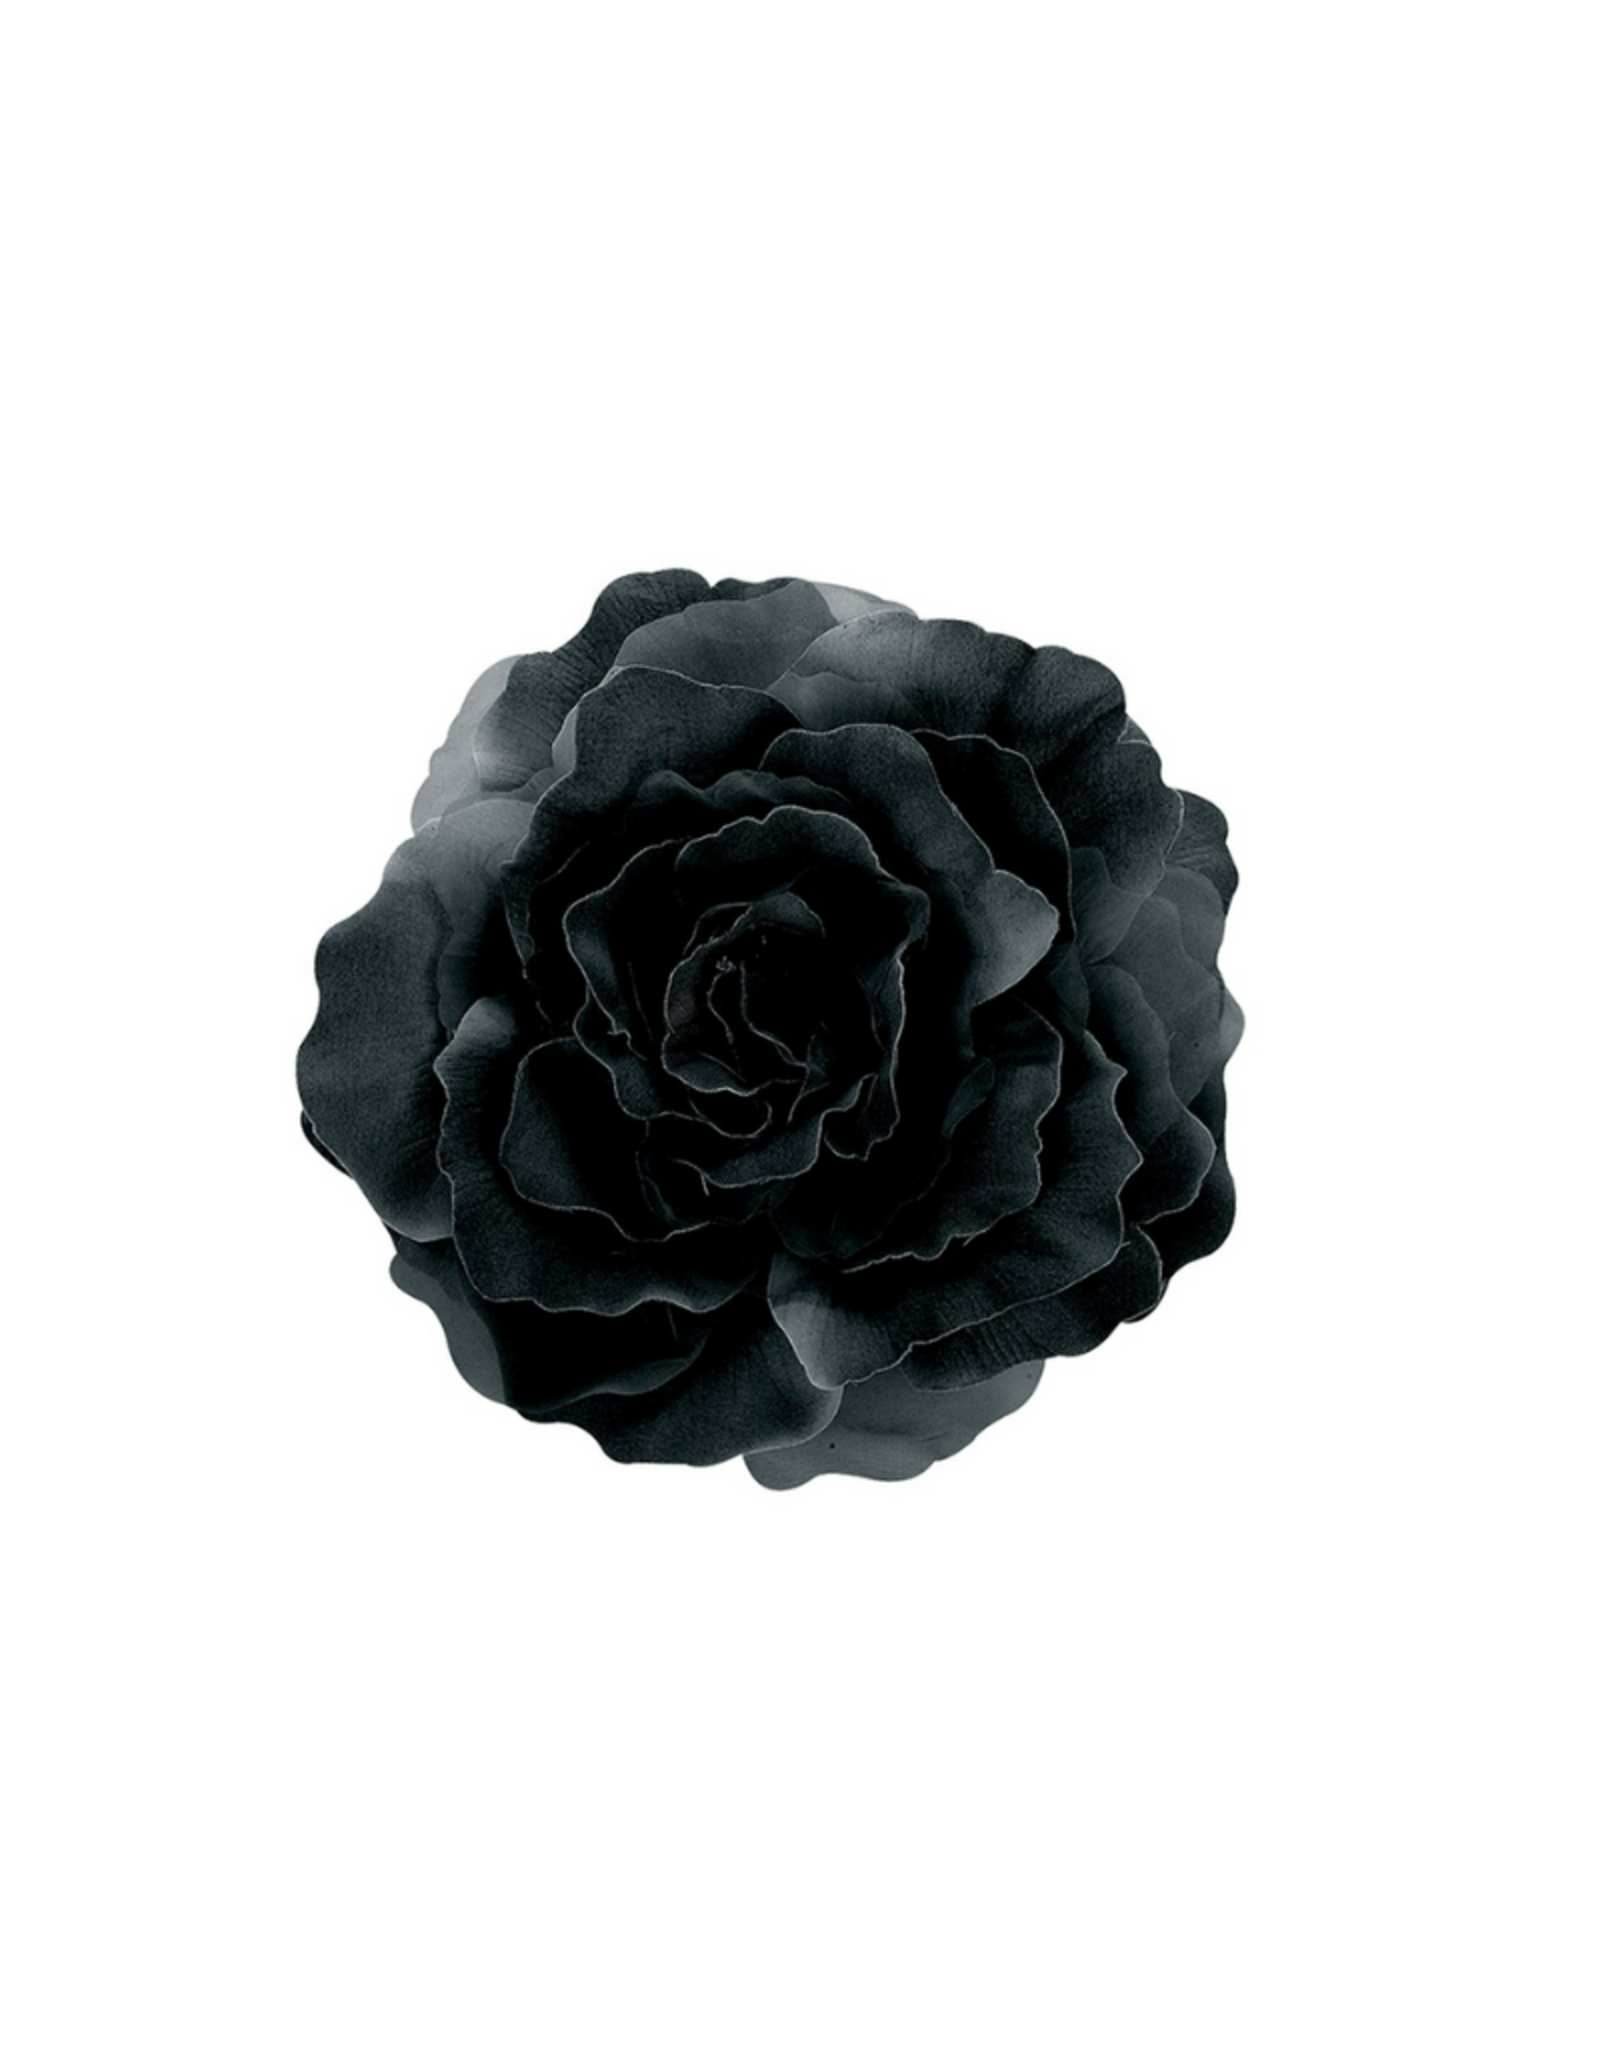 "HEADWEAR-DECOR-XL FLOWER PIN 7"" ROSE, SILK"